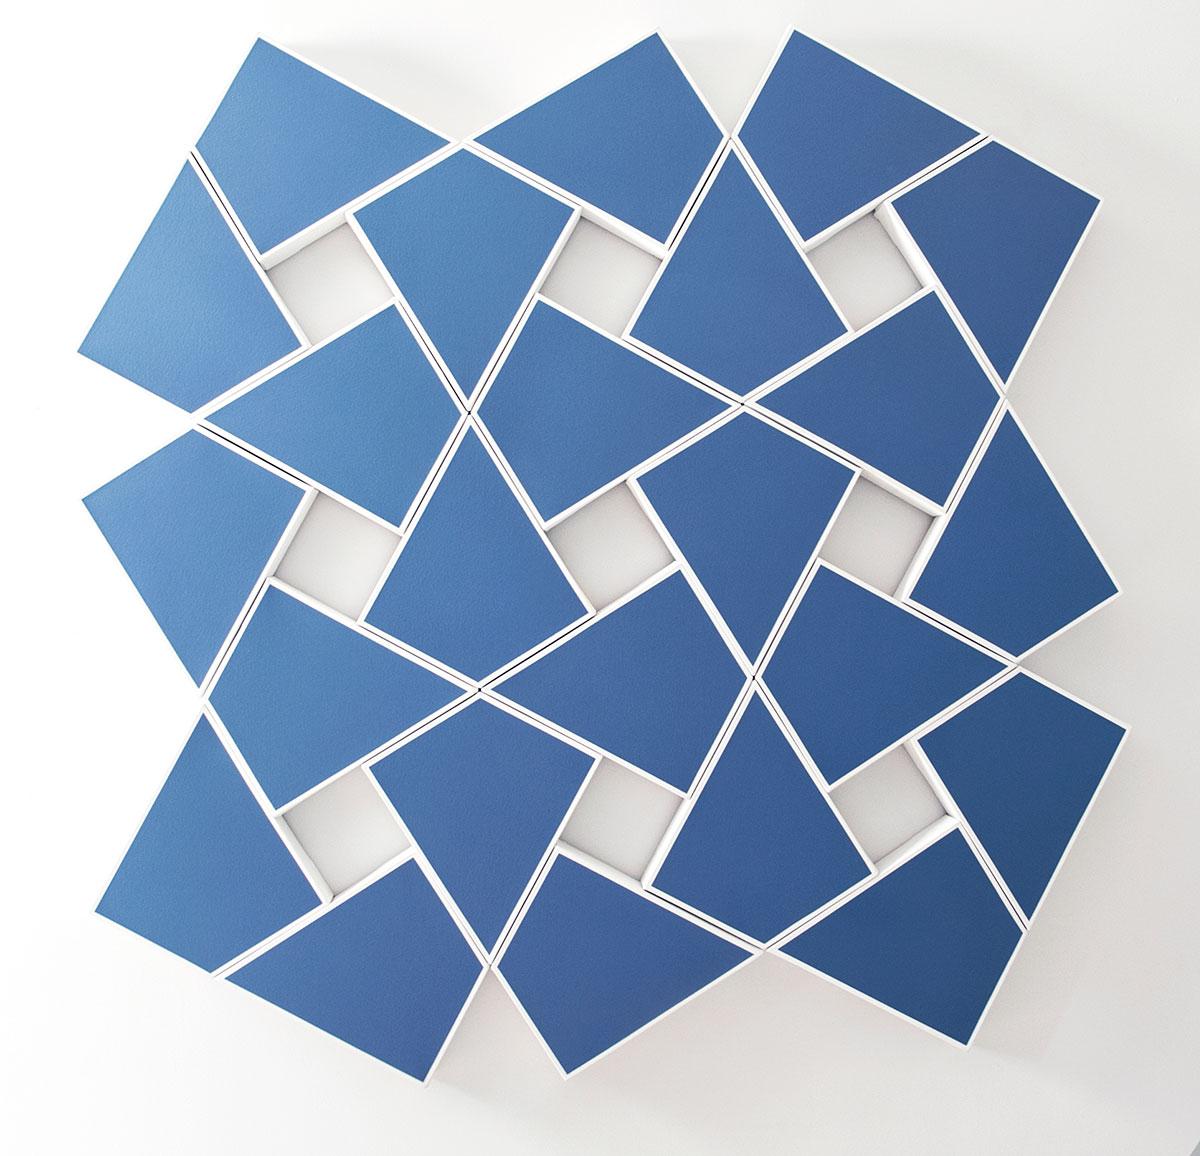 4 Naifeh_Blue_v2.jpg